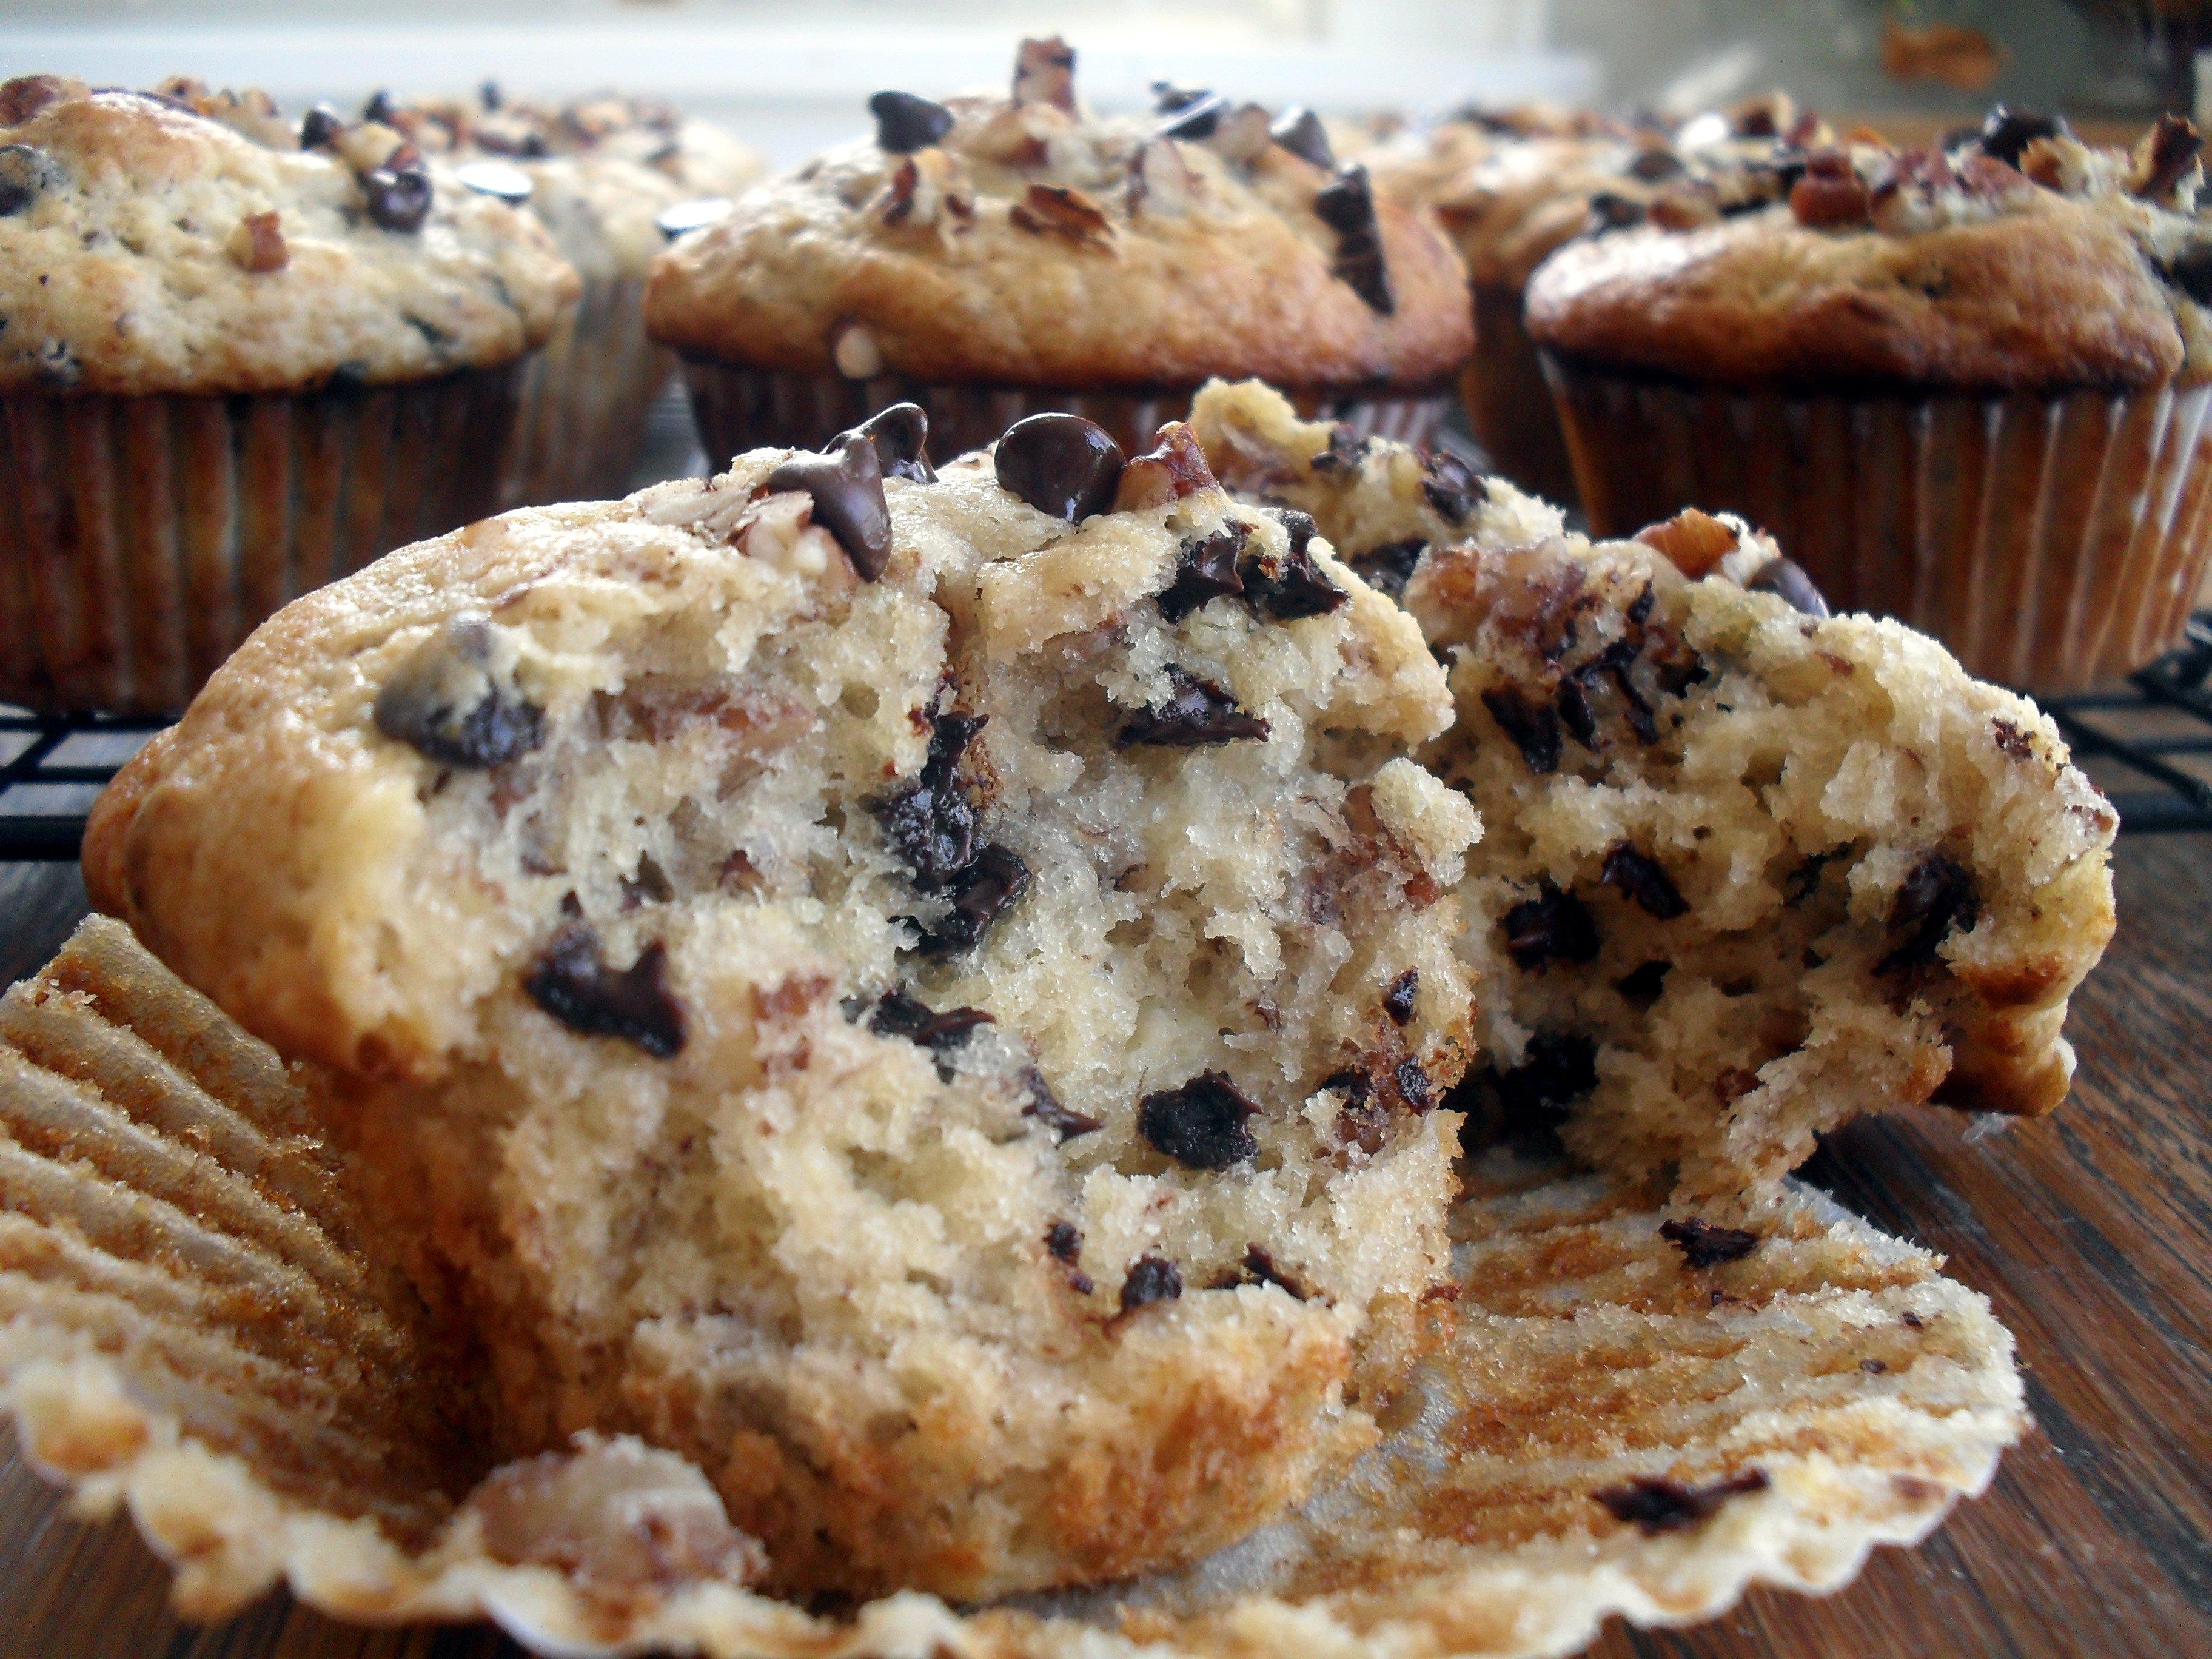 Banana Nut Chocolate Chip Muffins | Veronica's Cornucopia